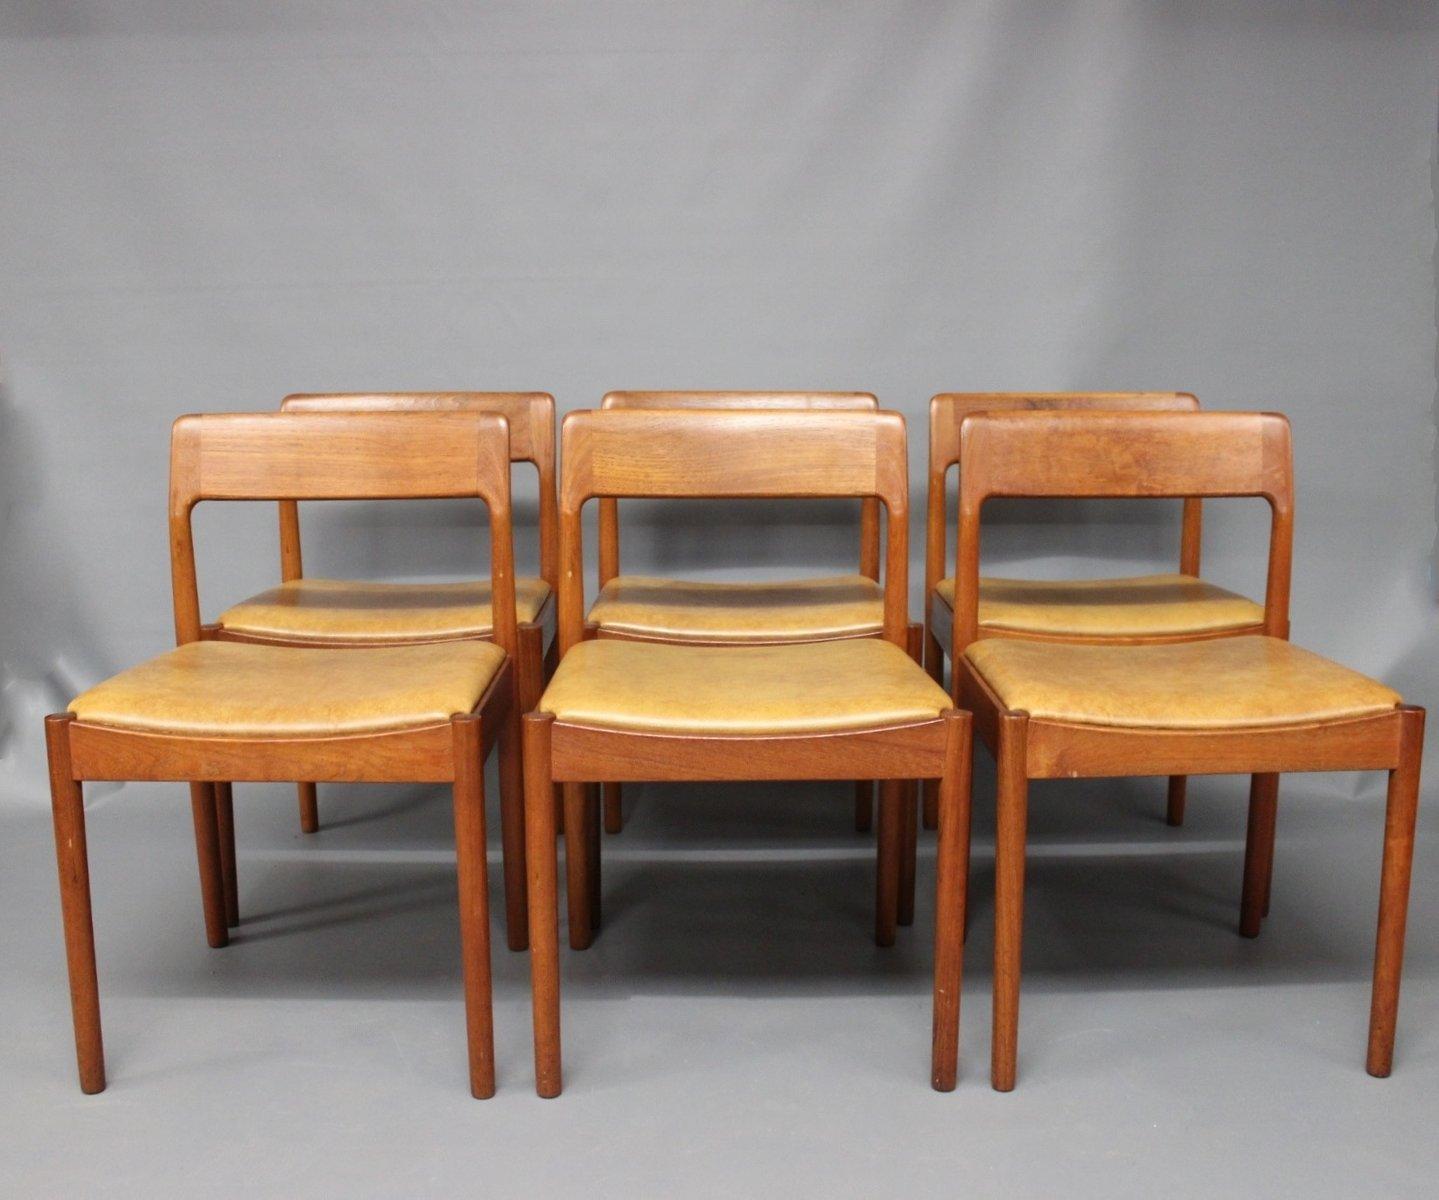 Dining Room Chairs by N.O. Møller for J.L. Møller, 1960s, Set of 6 ...